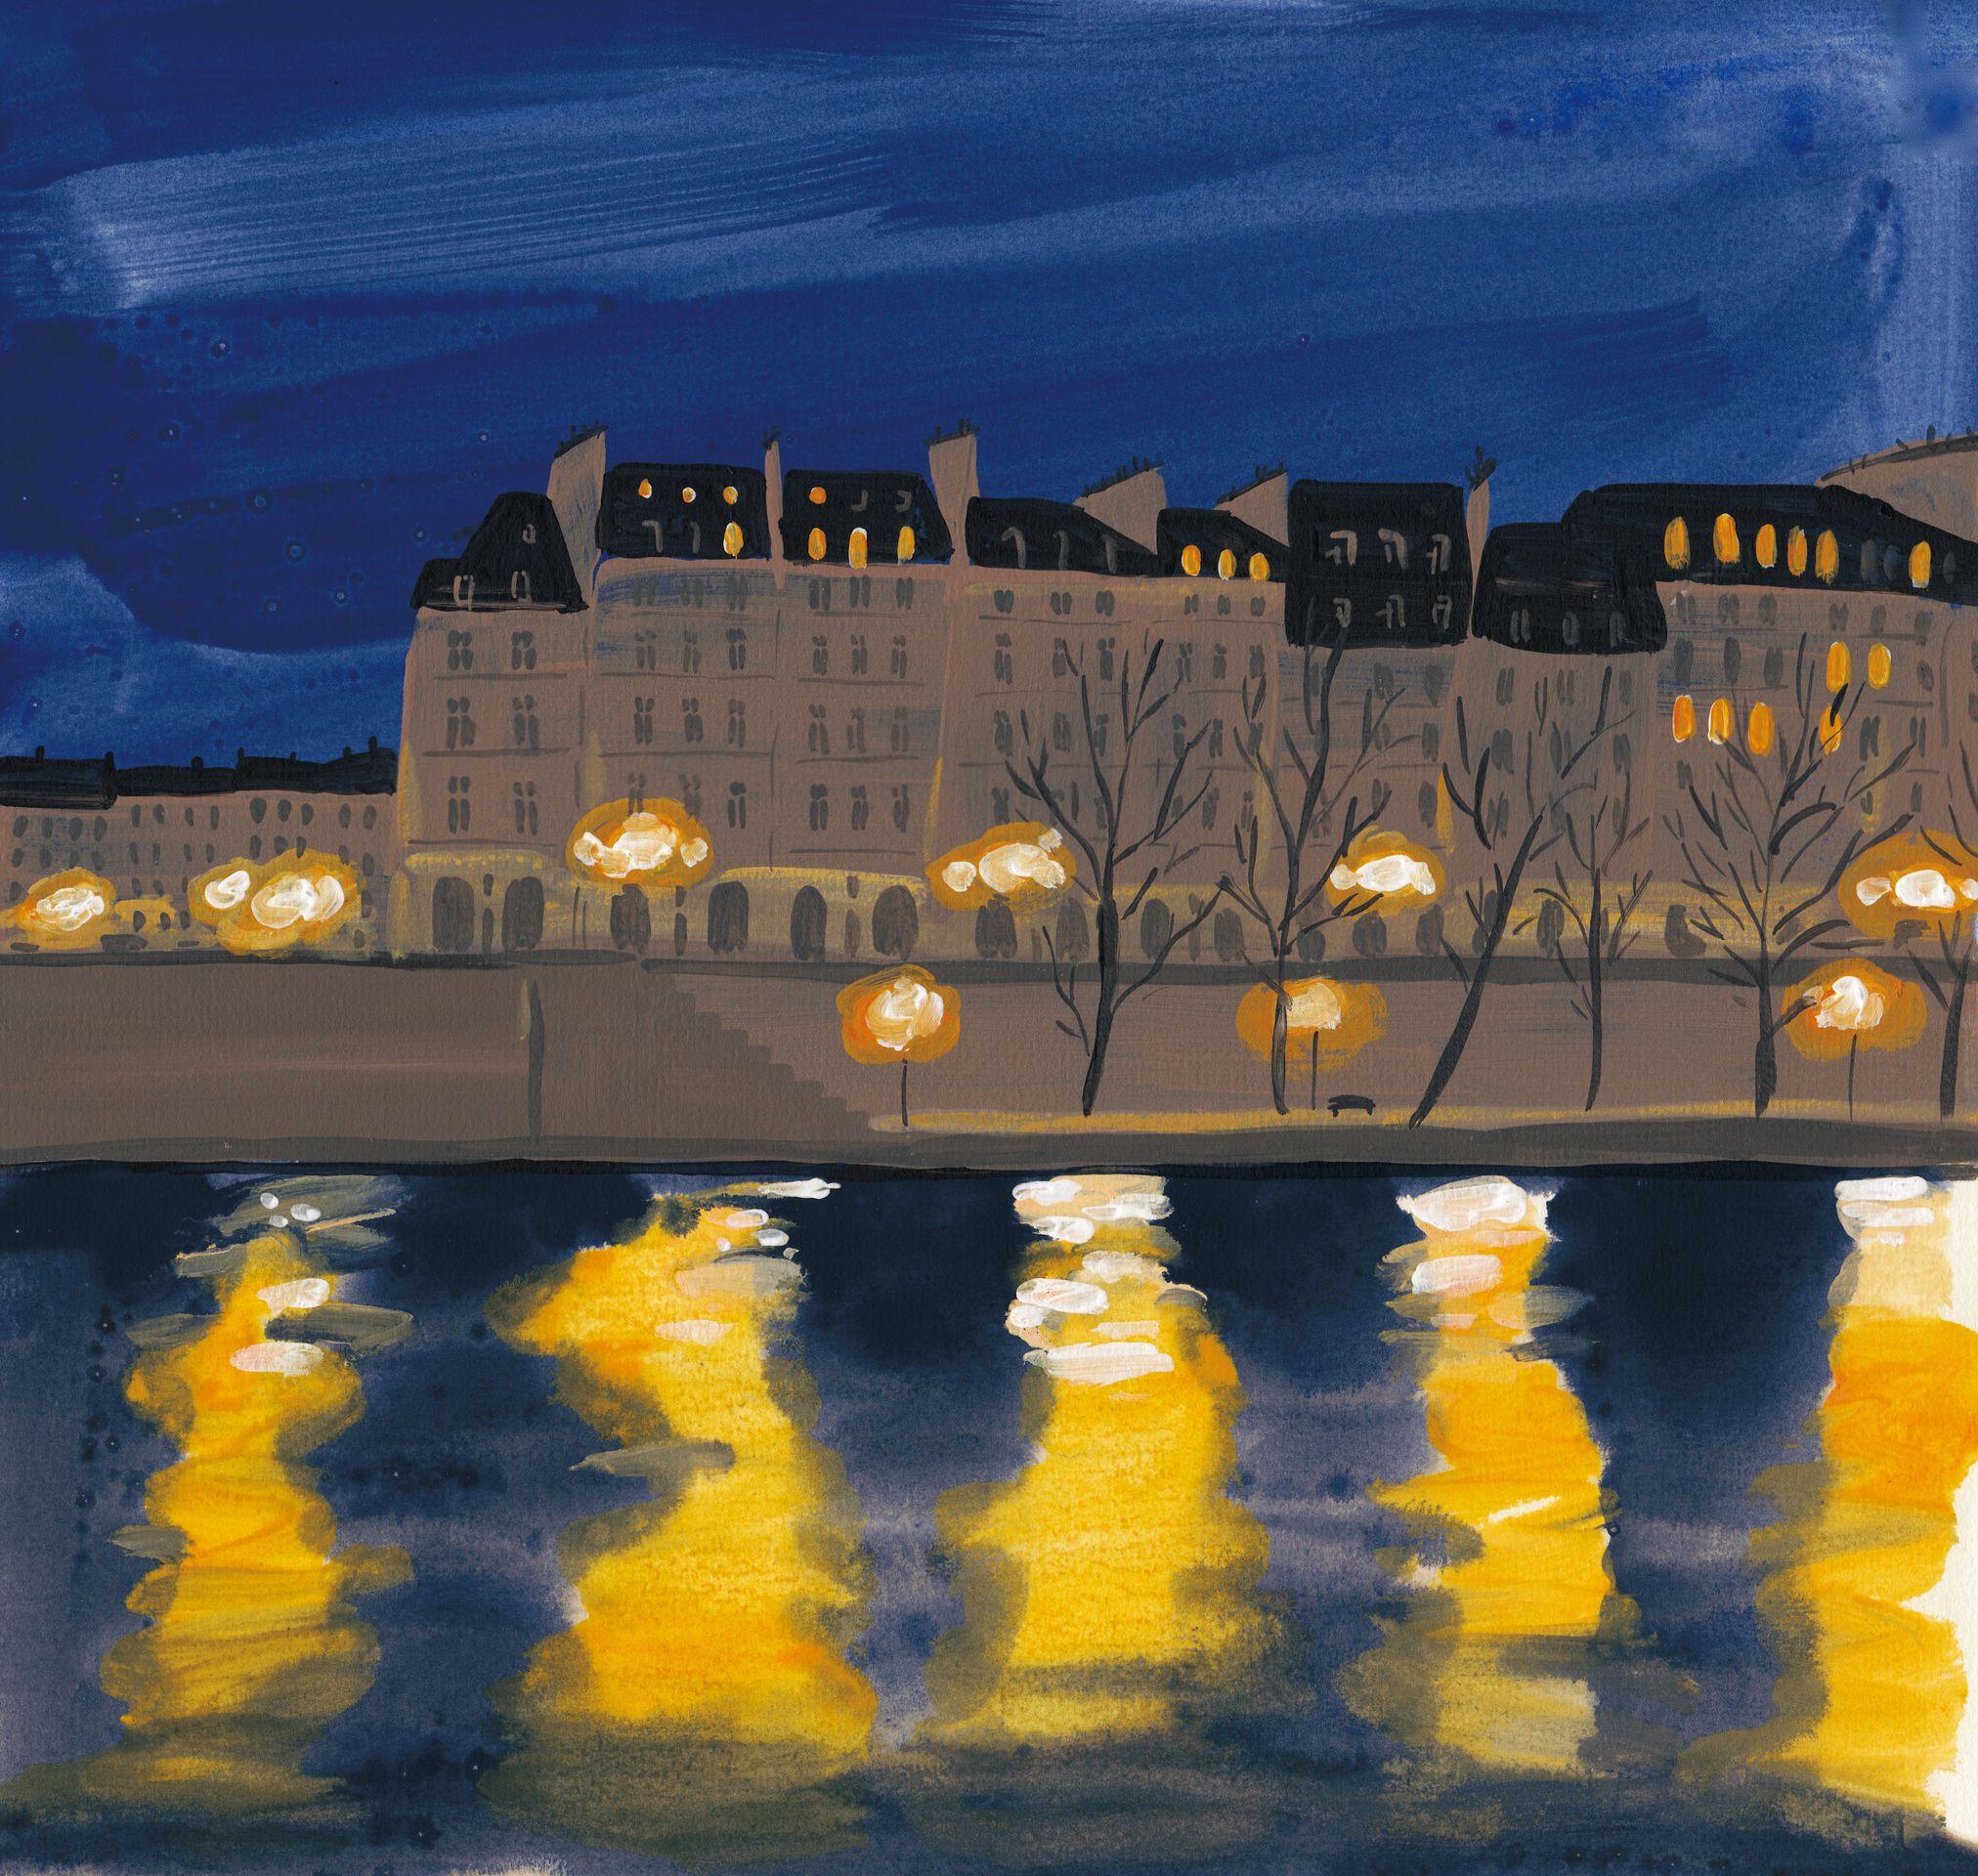 garance-illustration-Yukiko-Noritake-Projet-perso_10_Serie-de-Paris_web